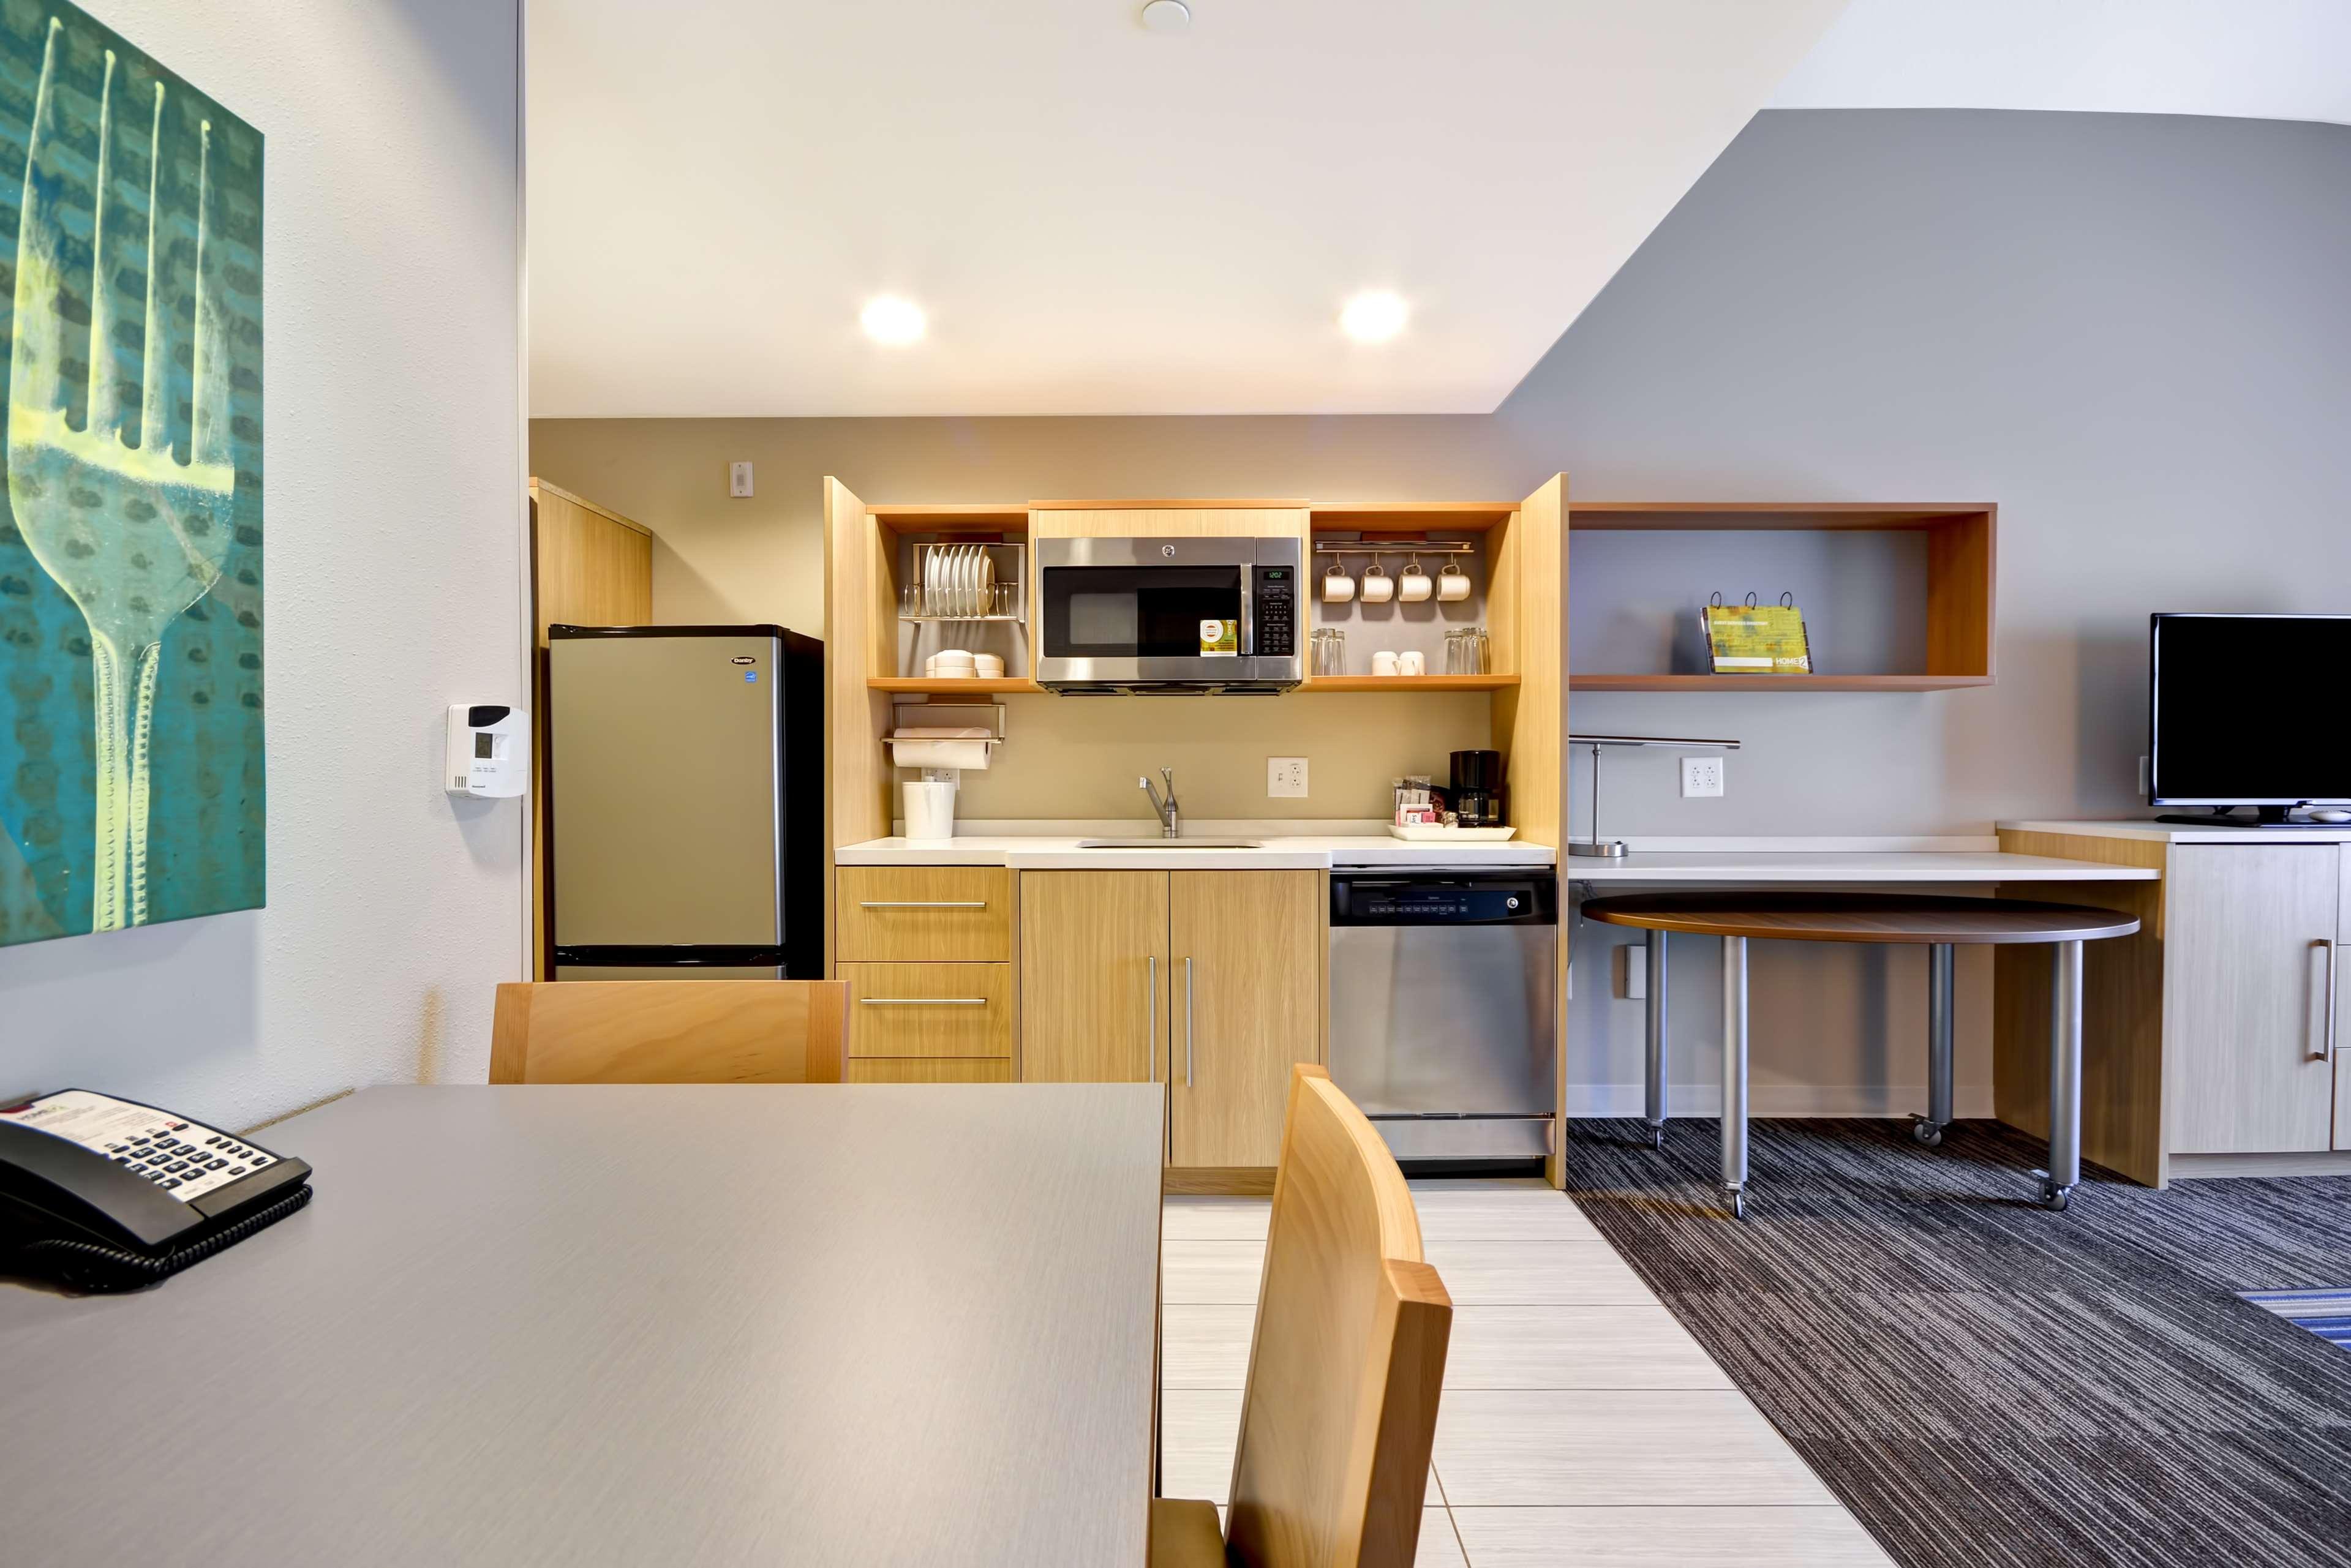 Home2 Suites by Hilton  St. Simons Island image 30